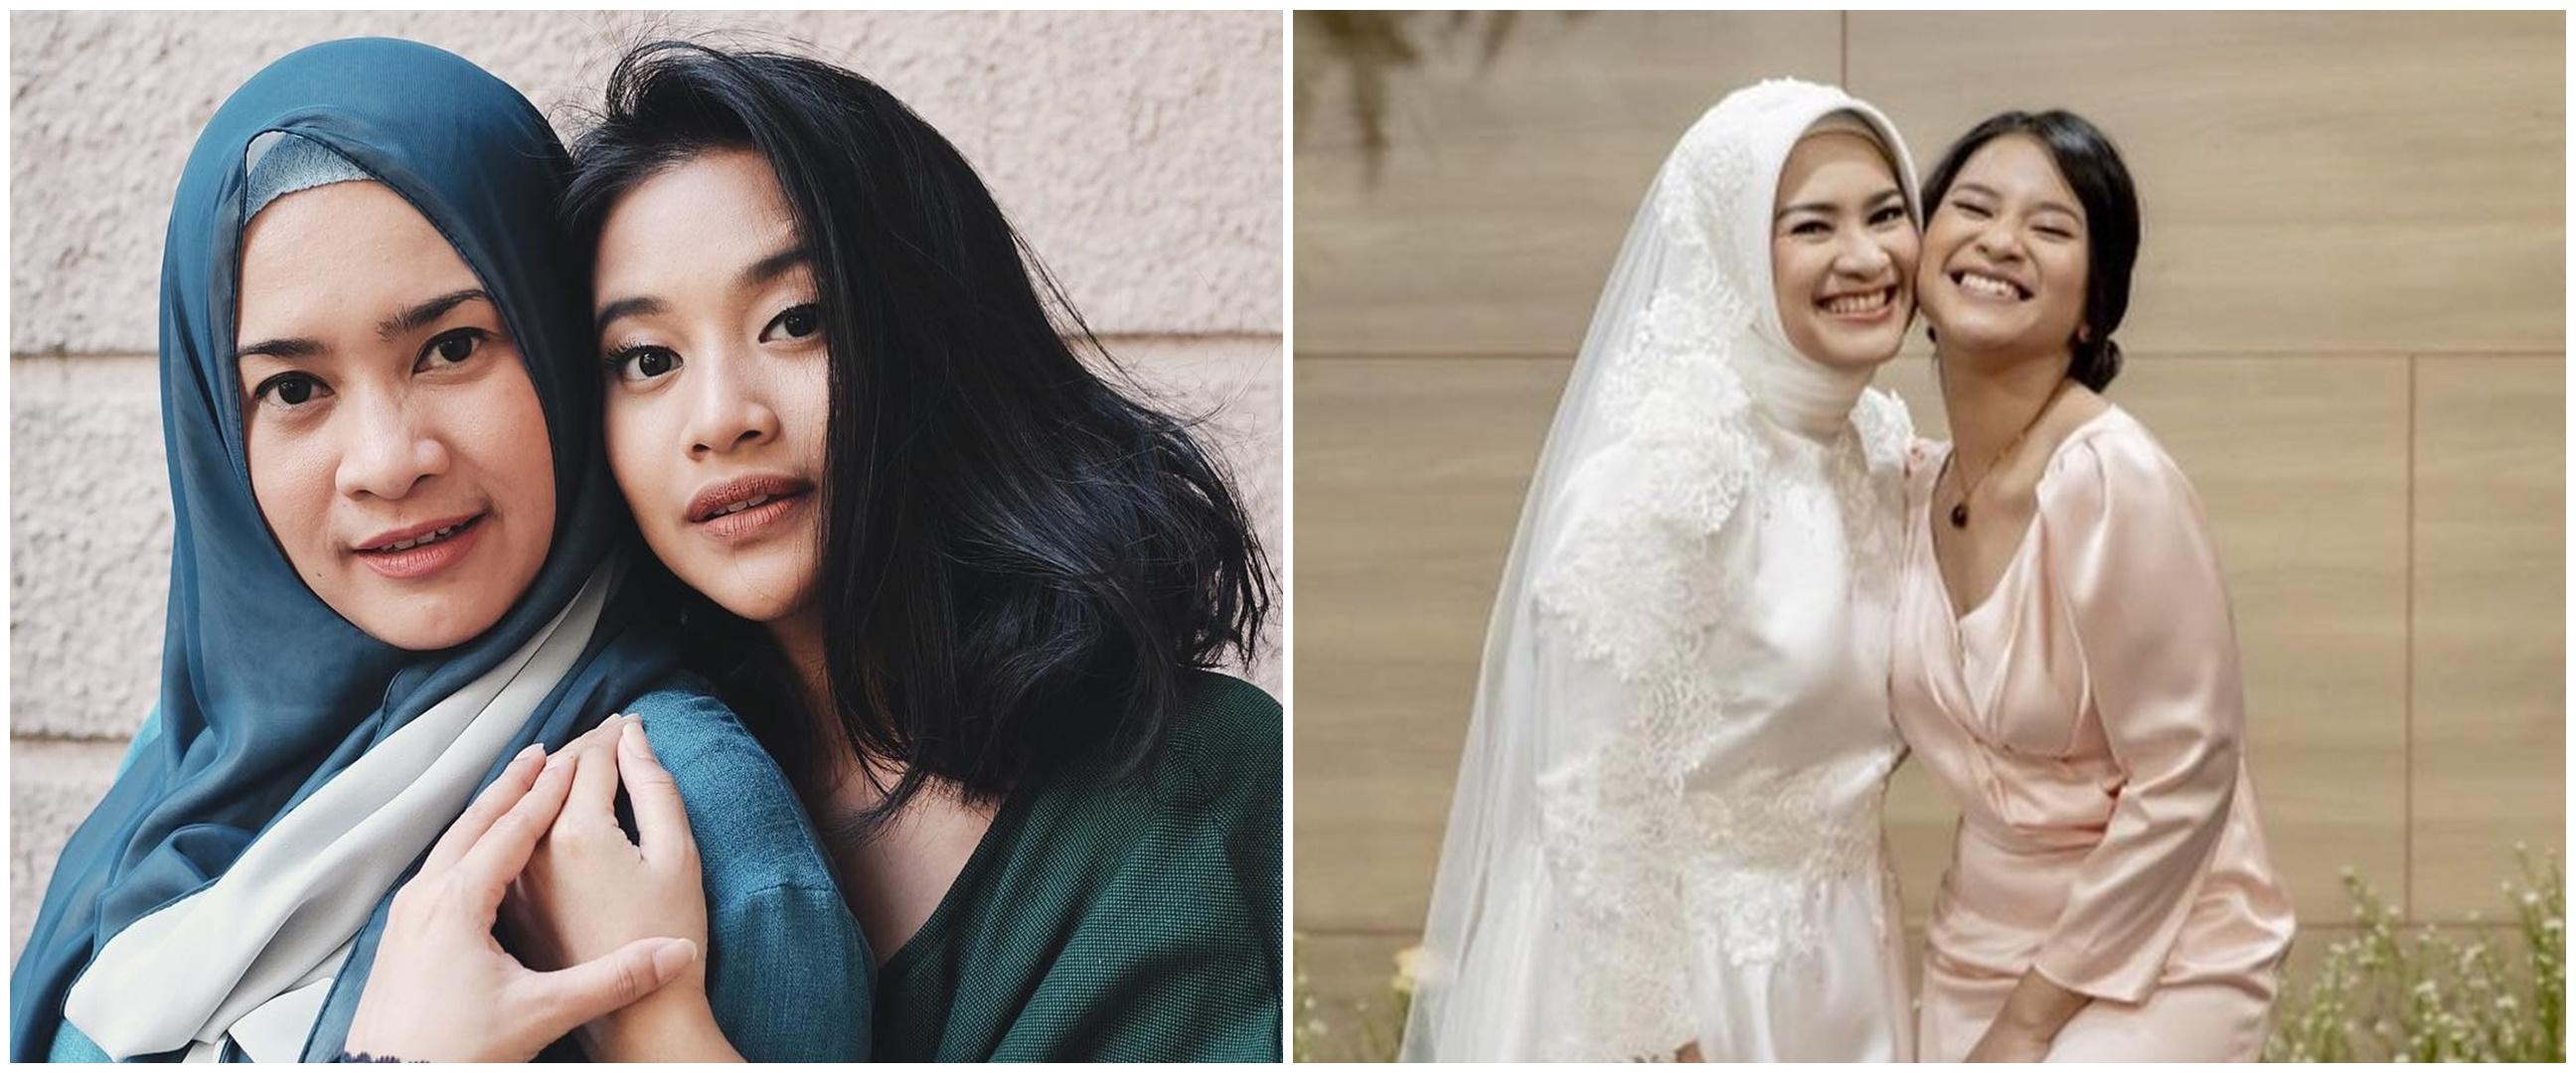 6 Pesona Siti Adira di pernikahan Ikke Nurjanah, curi perhatian